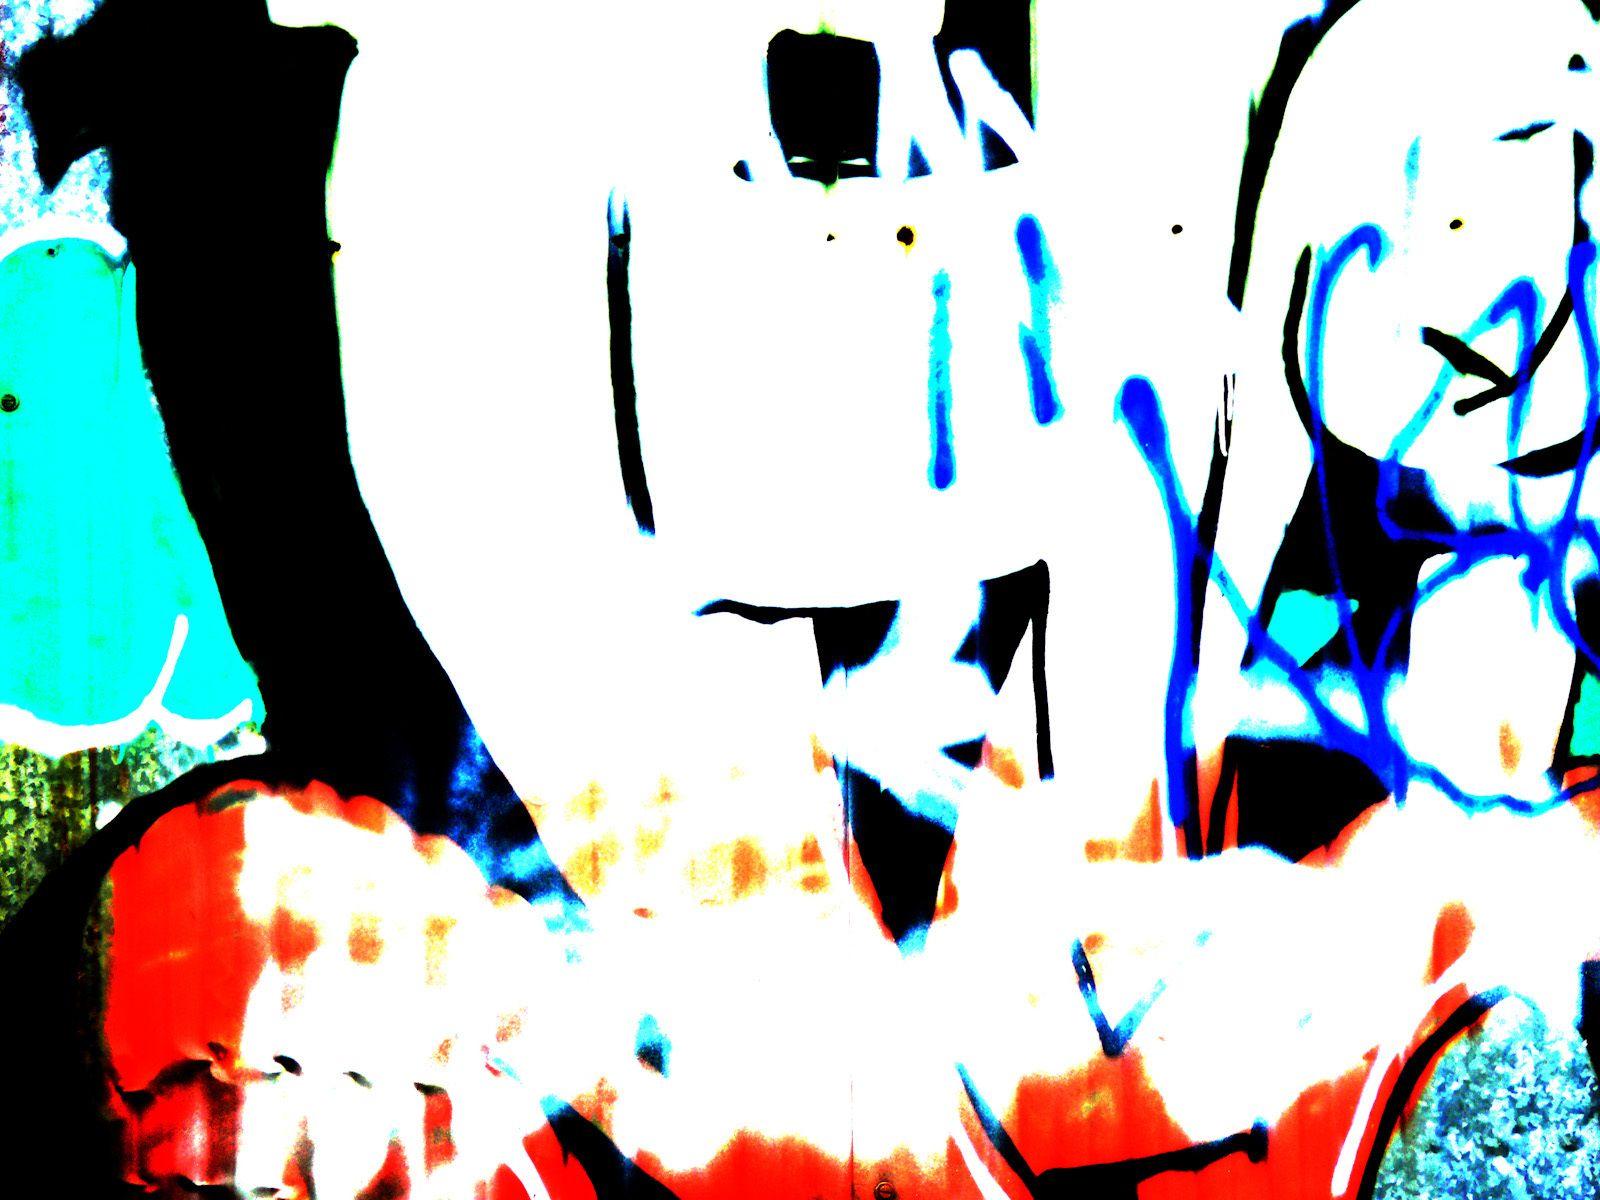 1resized___02__L1010926_rtP1.jpg